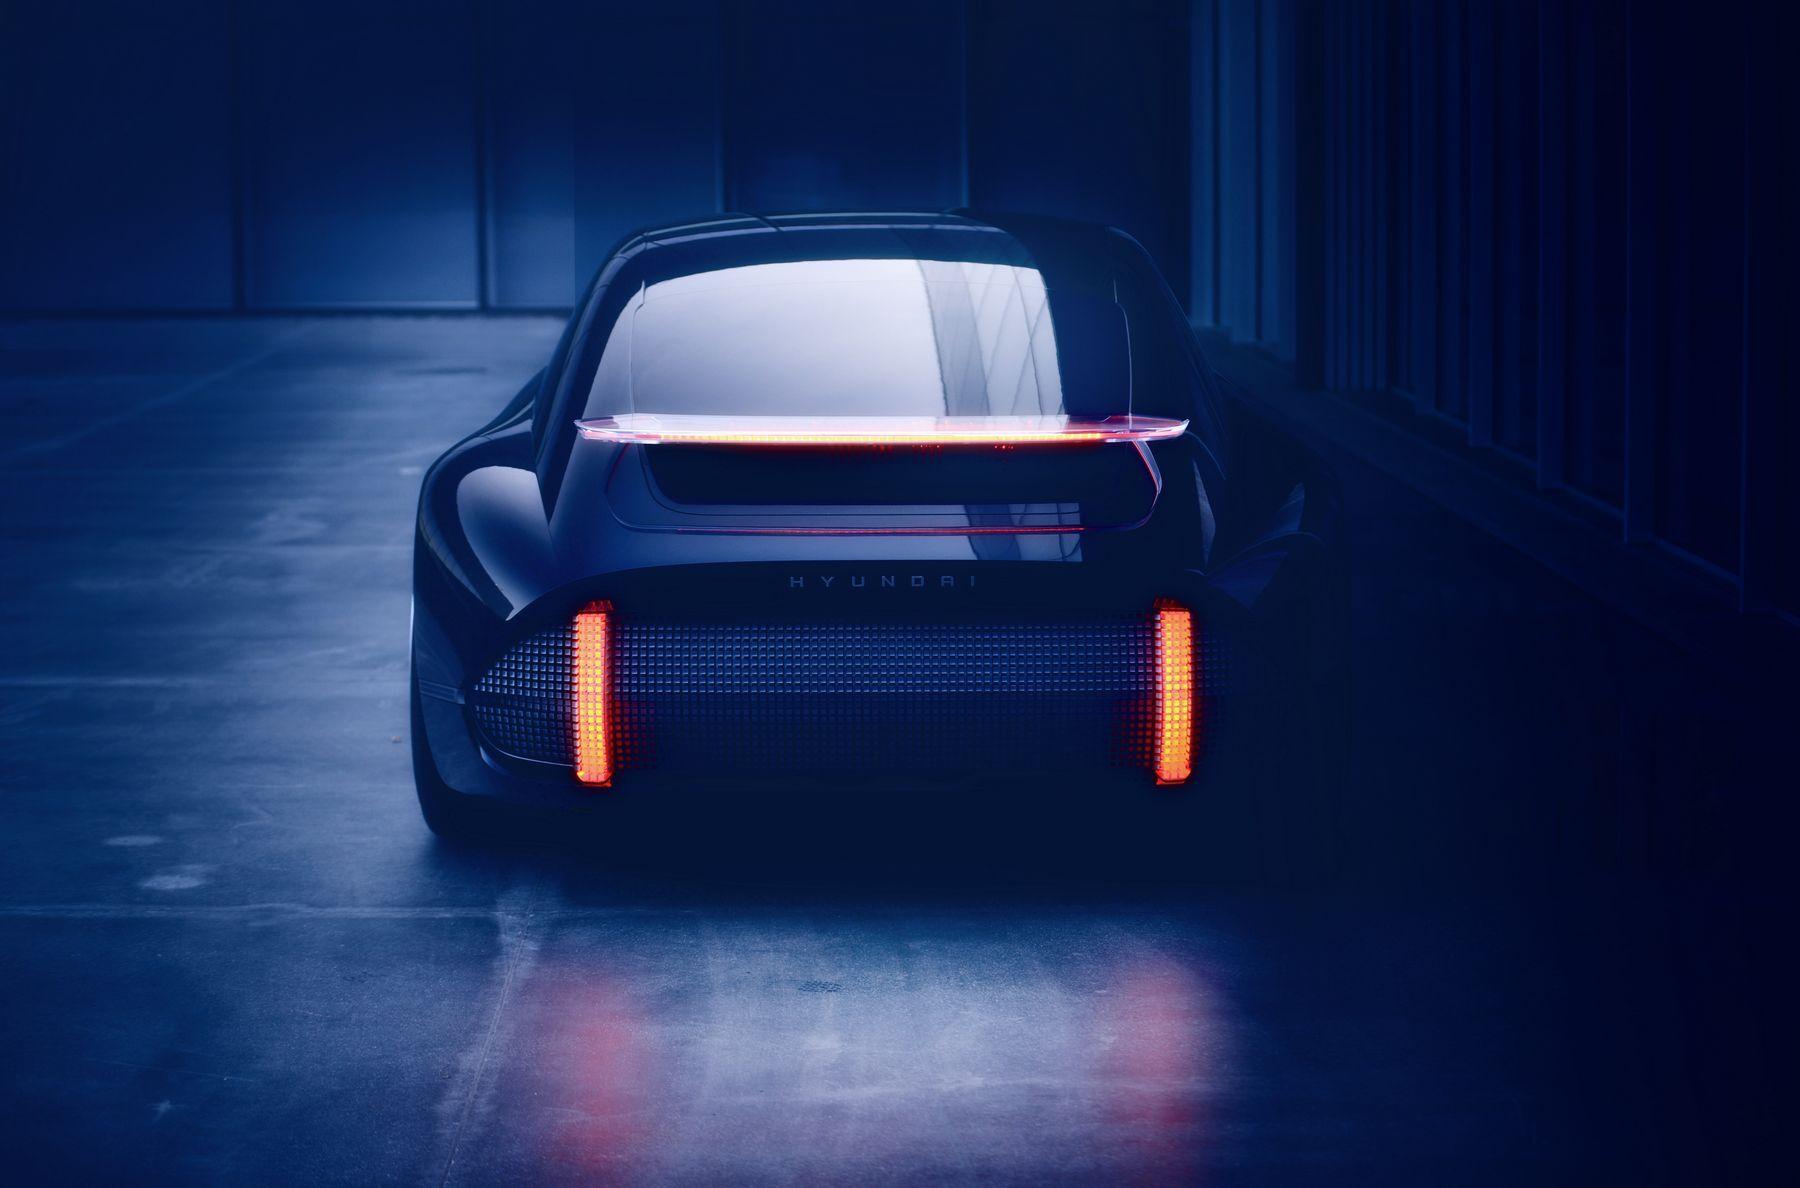 hyundai prophecy concept electric car 1 6